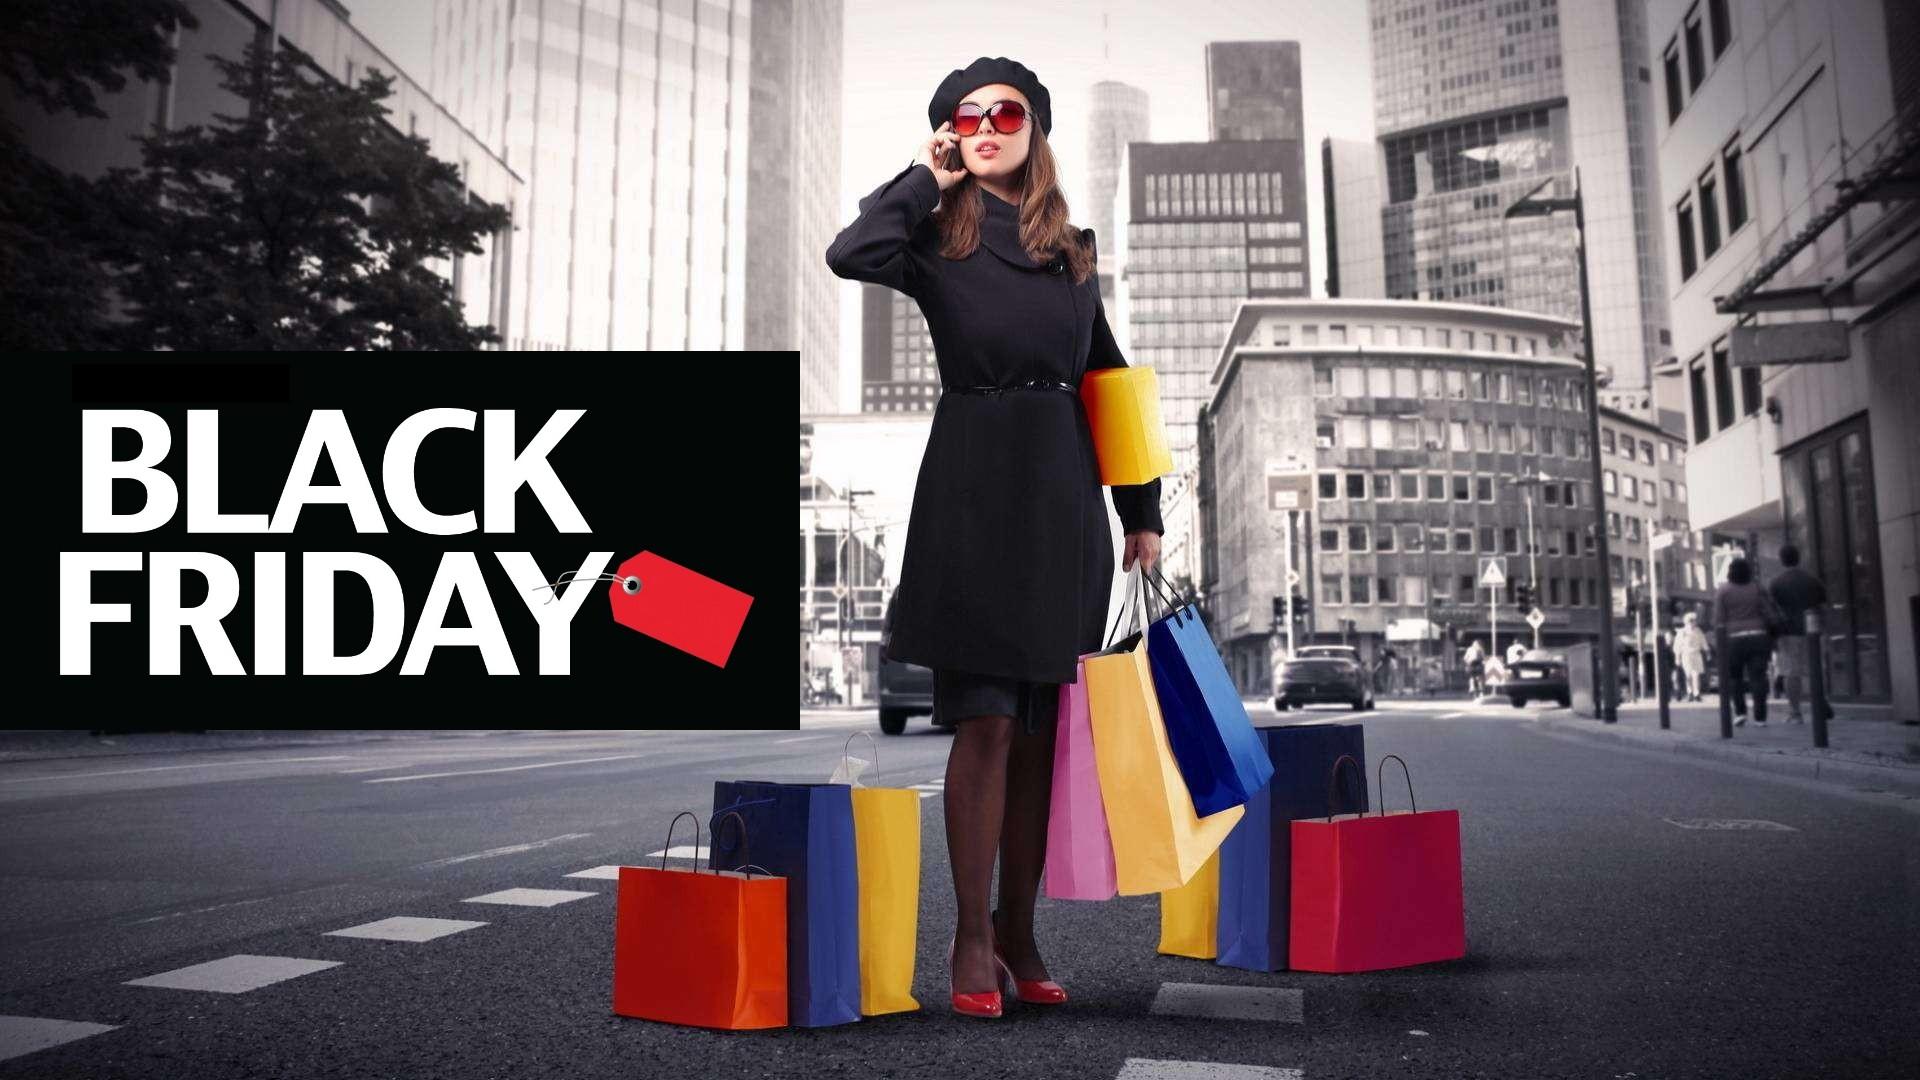 Black Friday High Quality